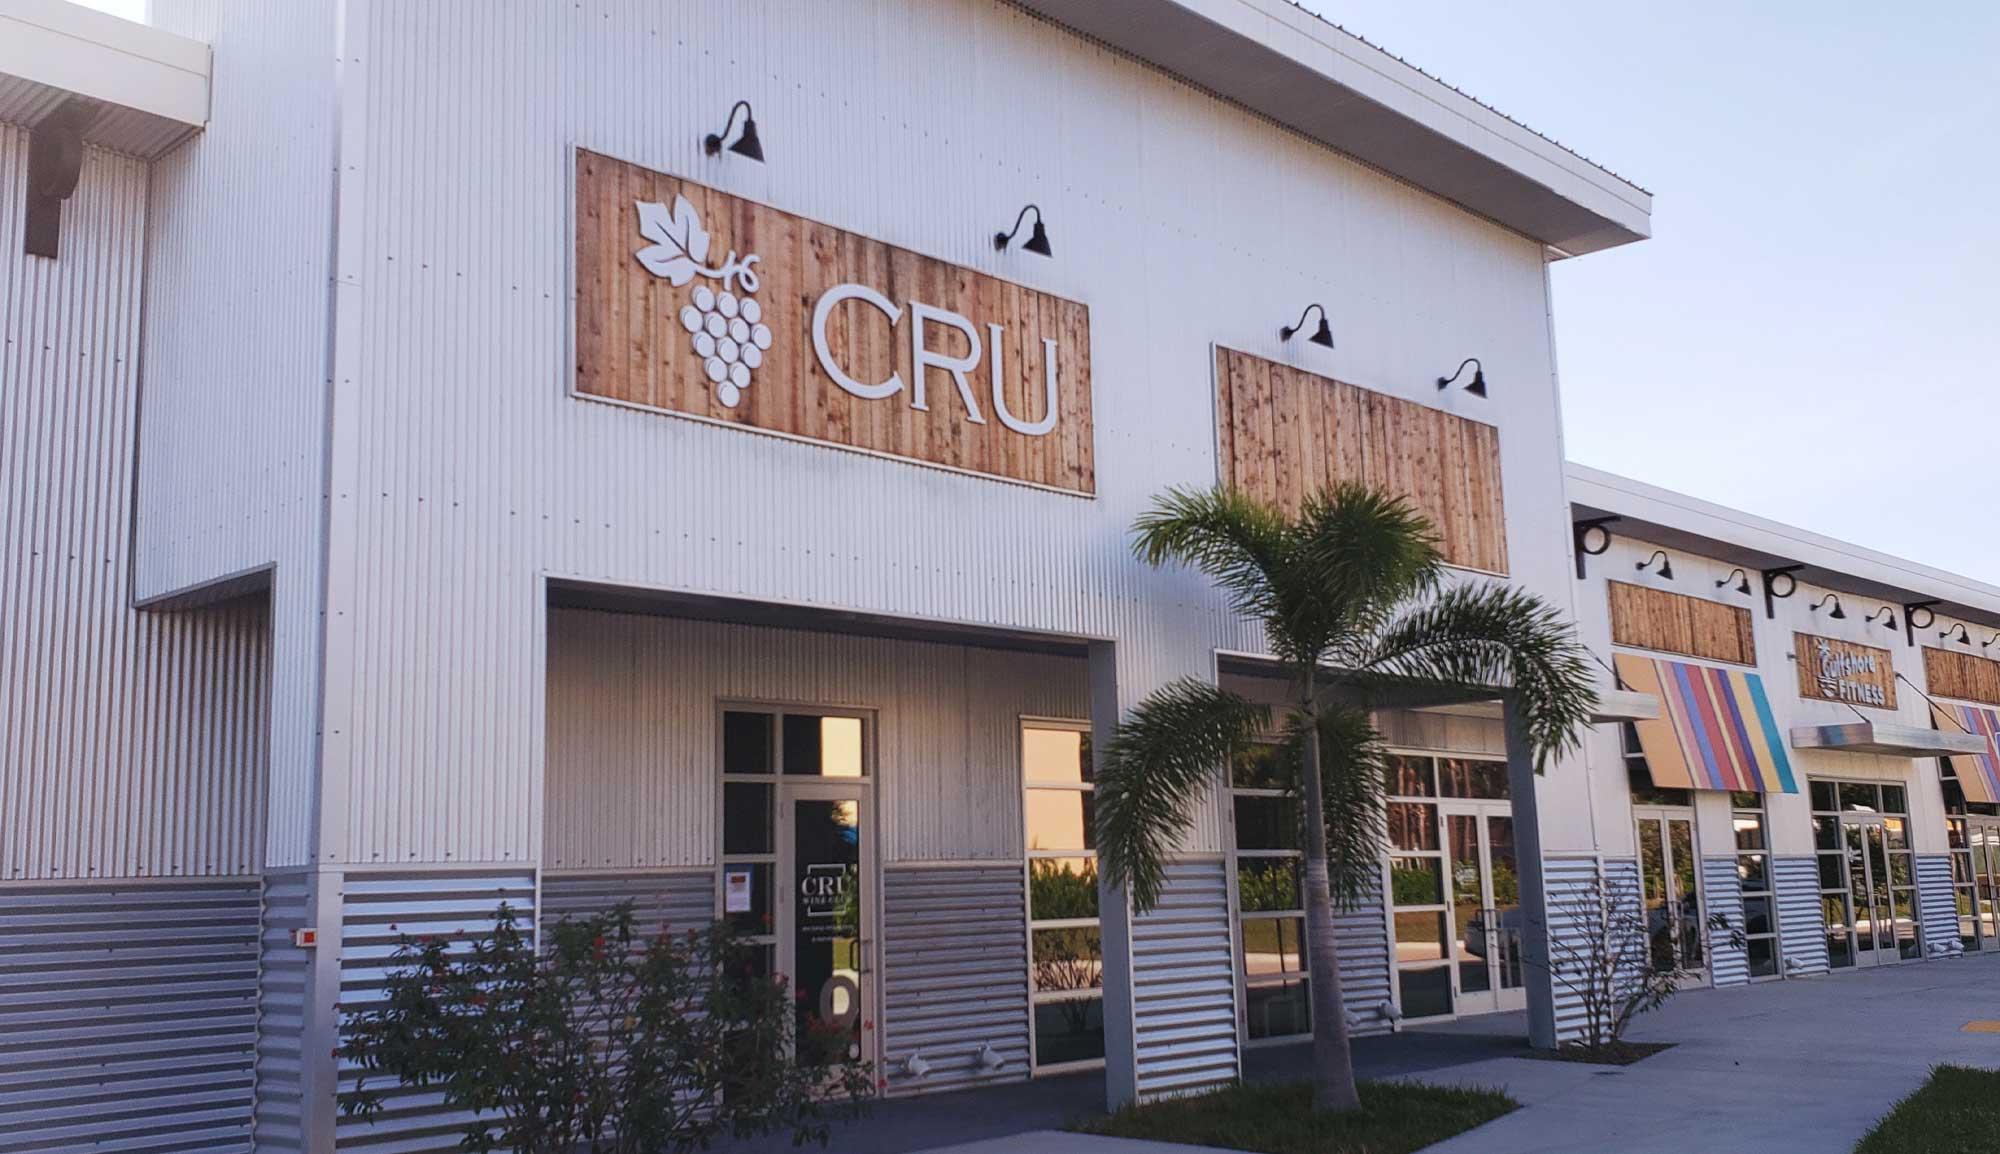 CRU Wine Club Bonita Springs Wine Tasting Store Front | CRU Wine Club